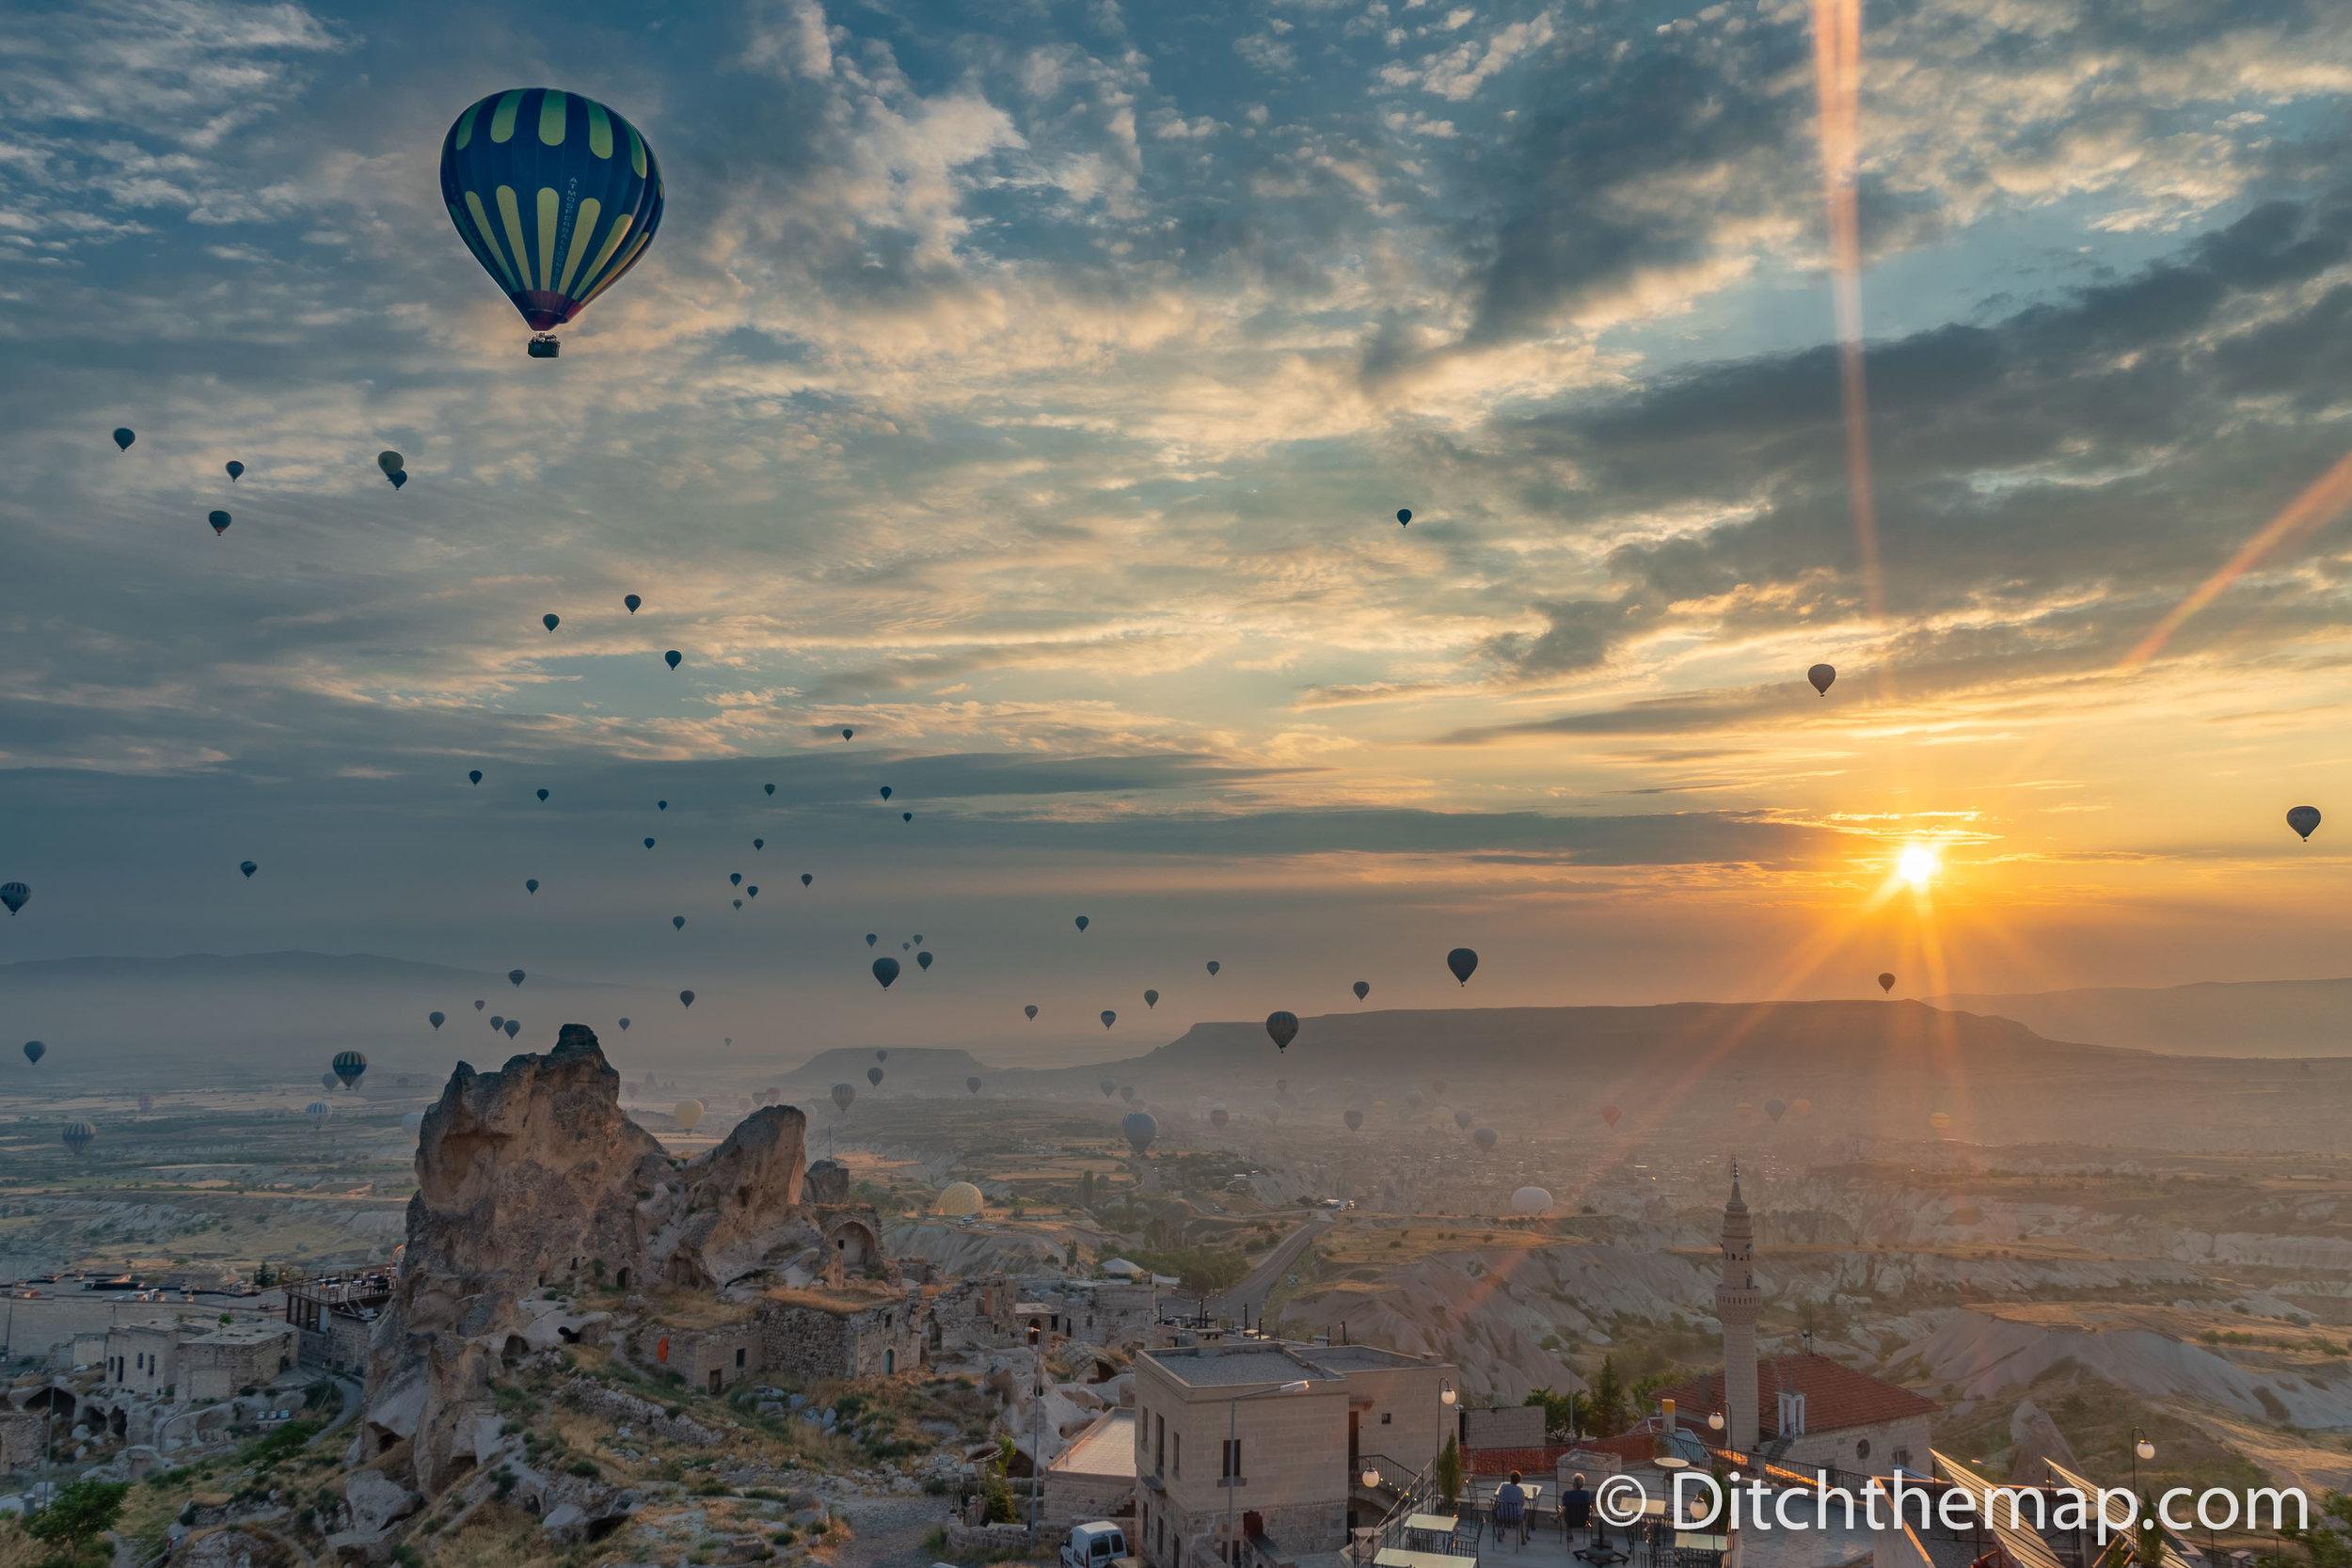 Balloons in the sky in Cappadocia Central Turkey